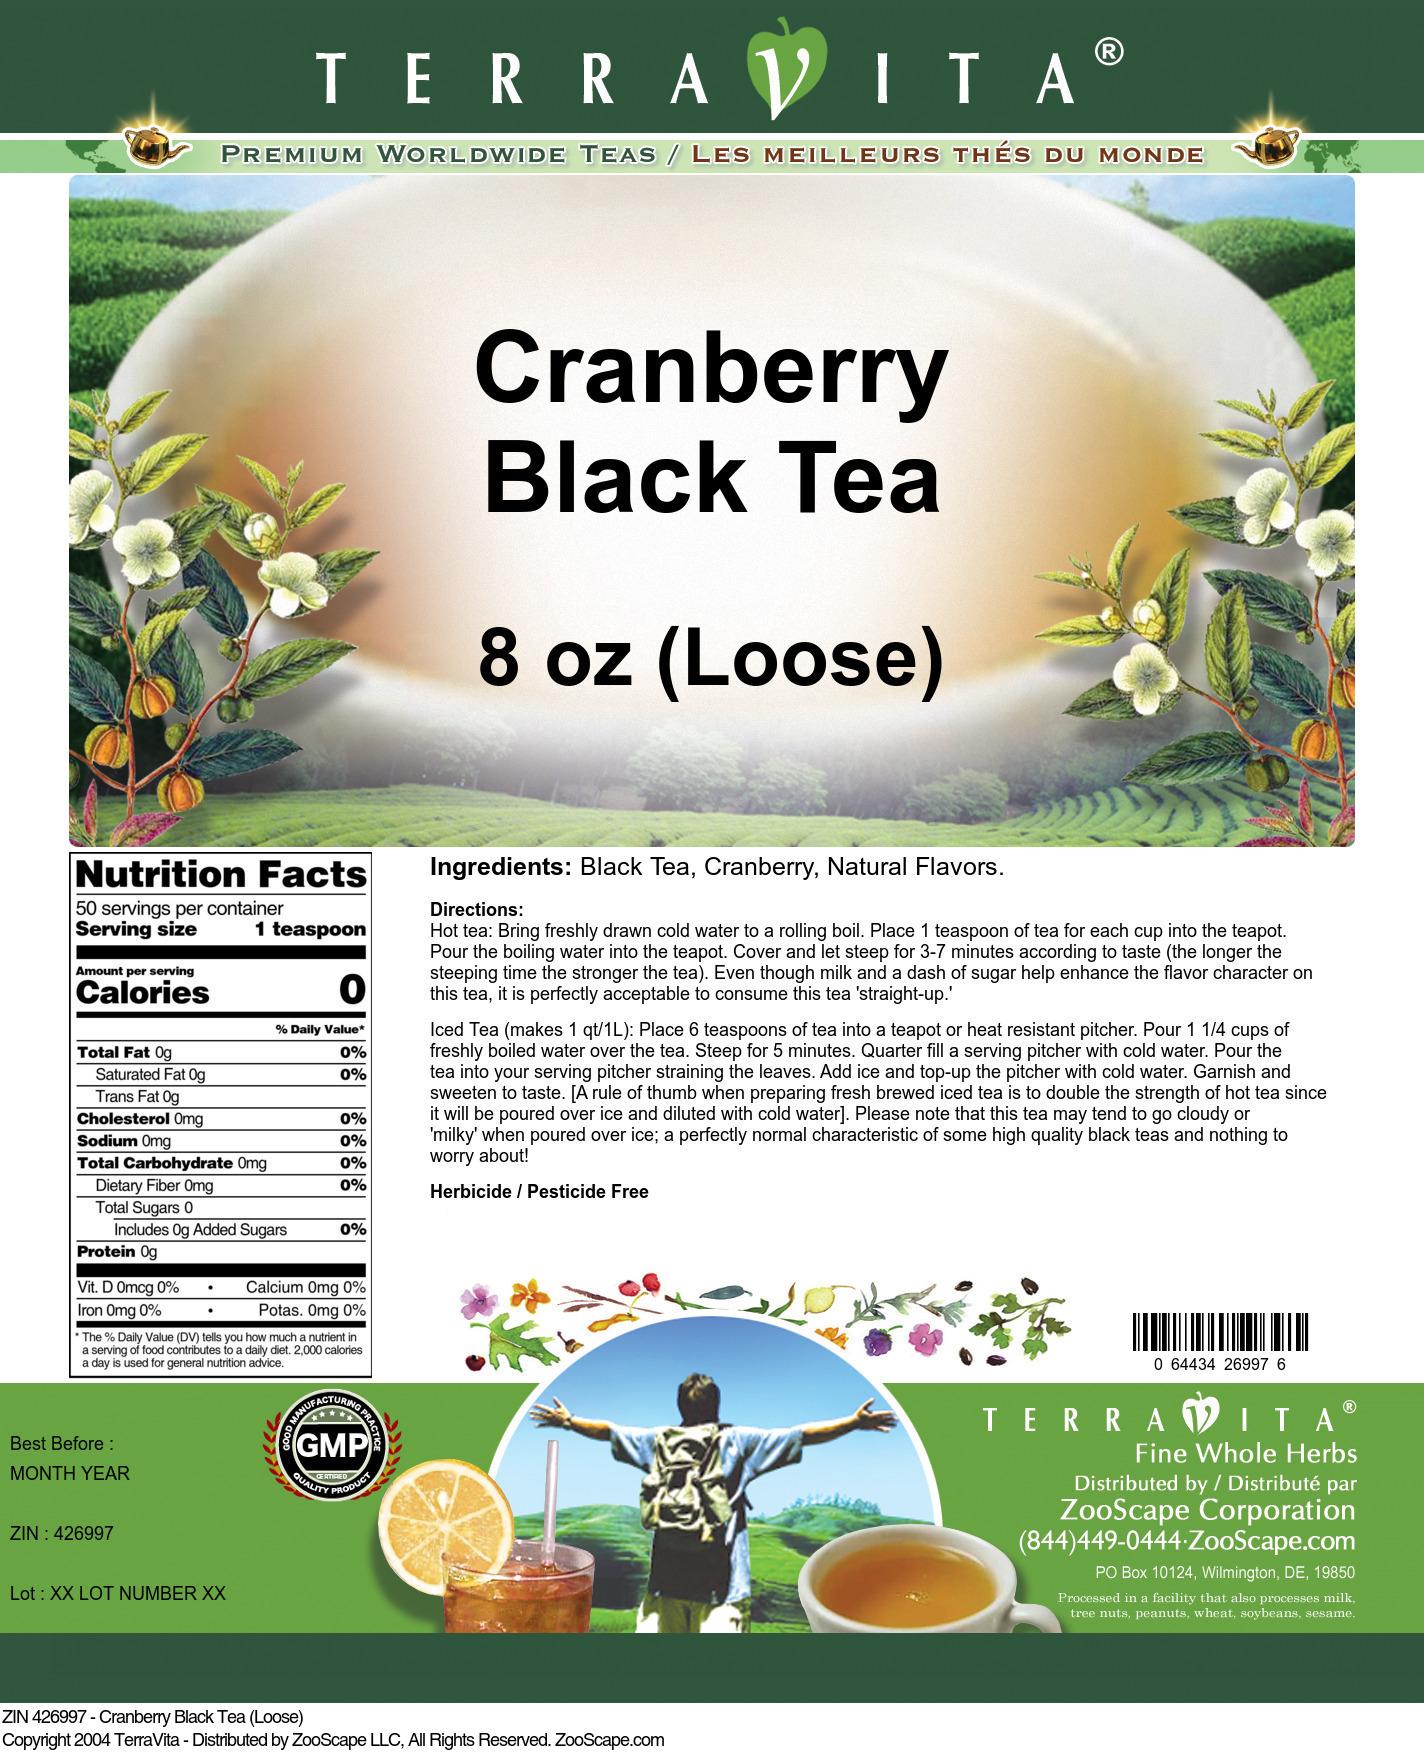 Cranberry Black Tea (Loose)